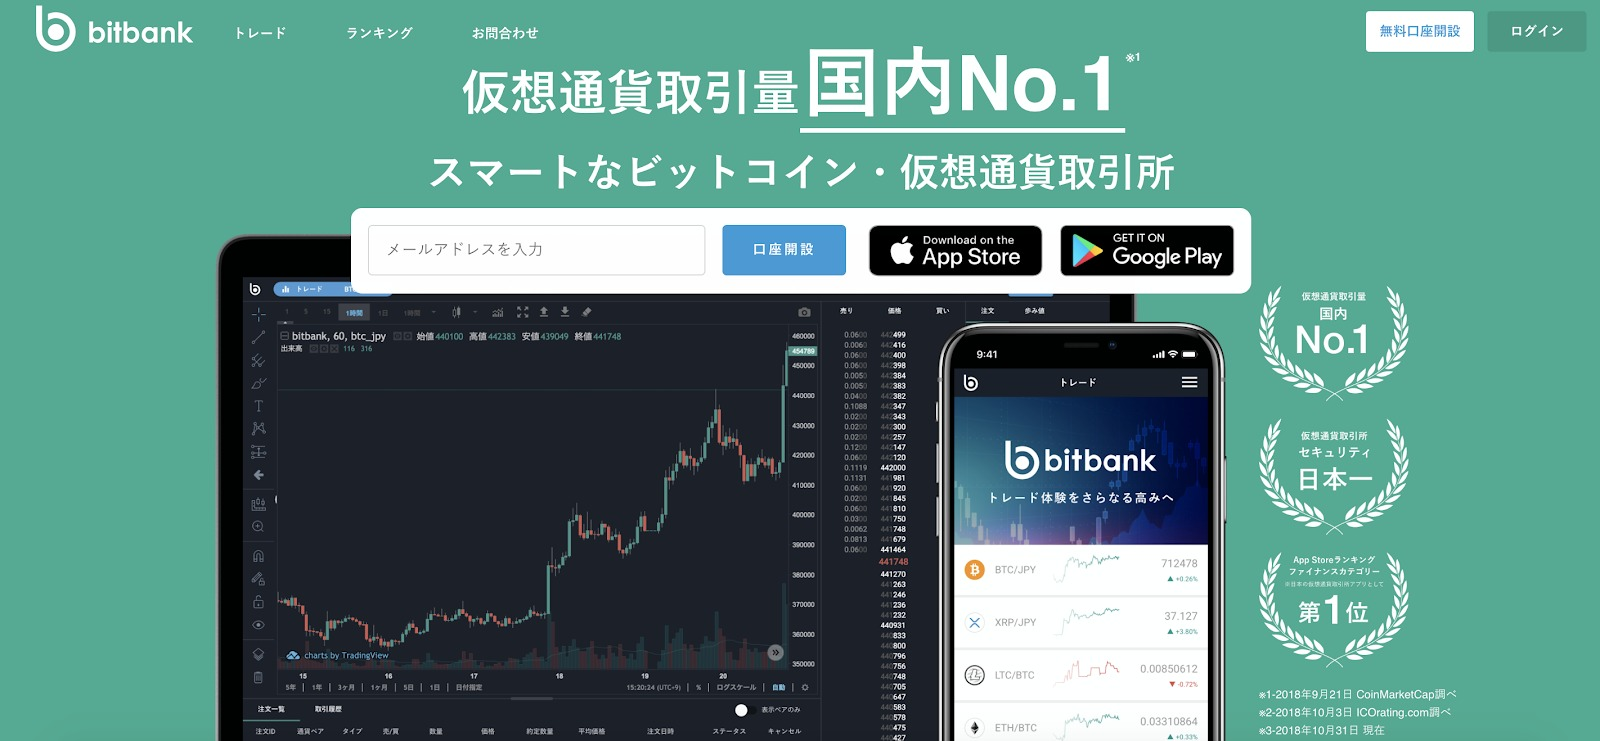 bitbankトップページ